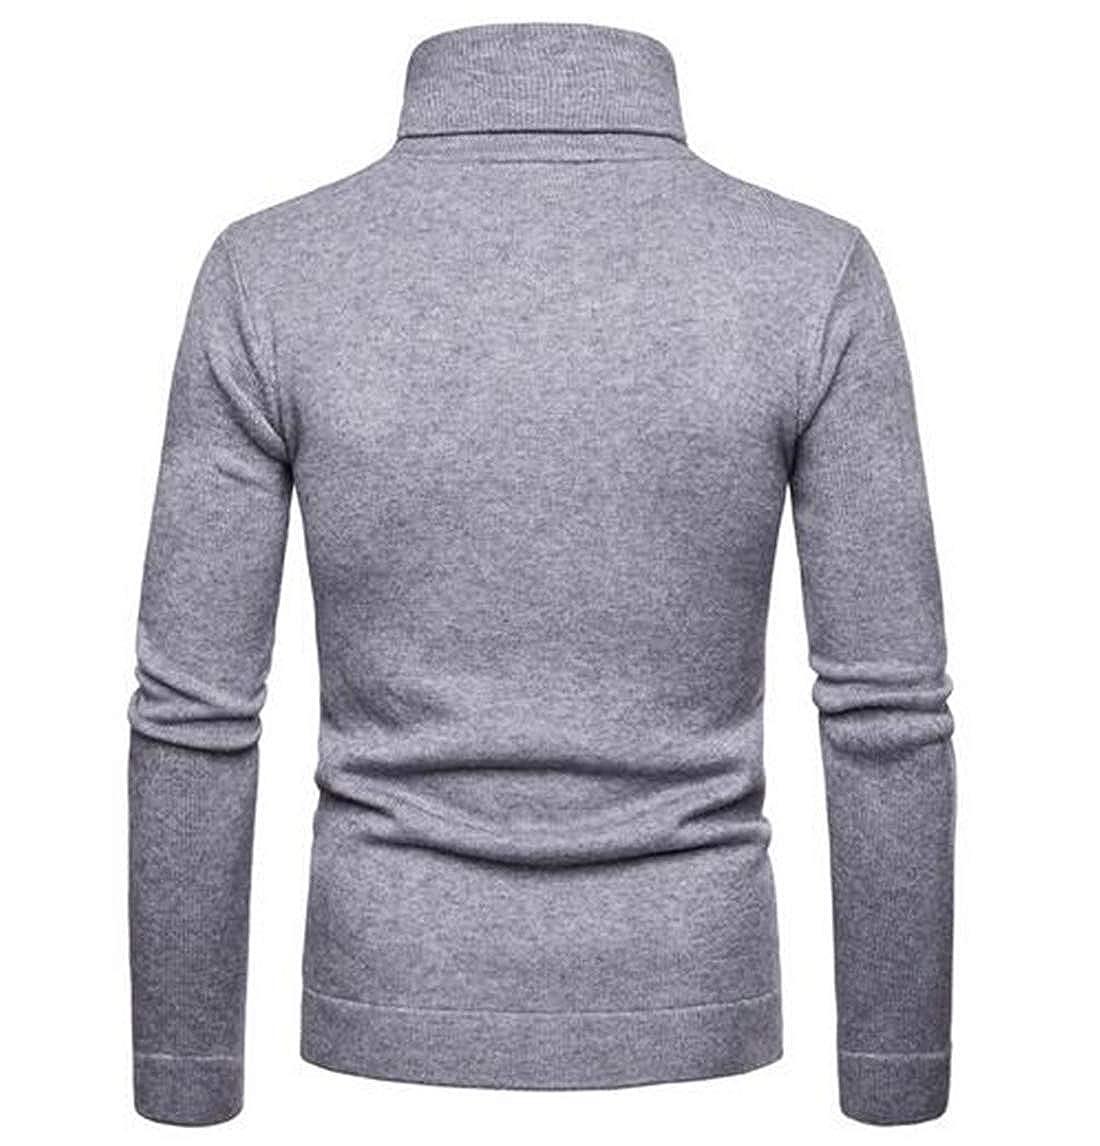 XiaoTianXinMen XTX Men Knit Shawl Collar Slim Solid Oblique Zipper Pullover Knitwear Sweater